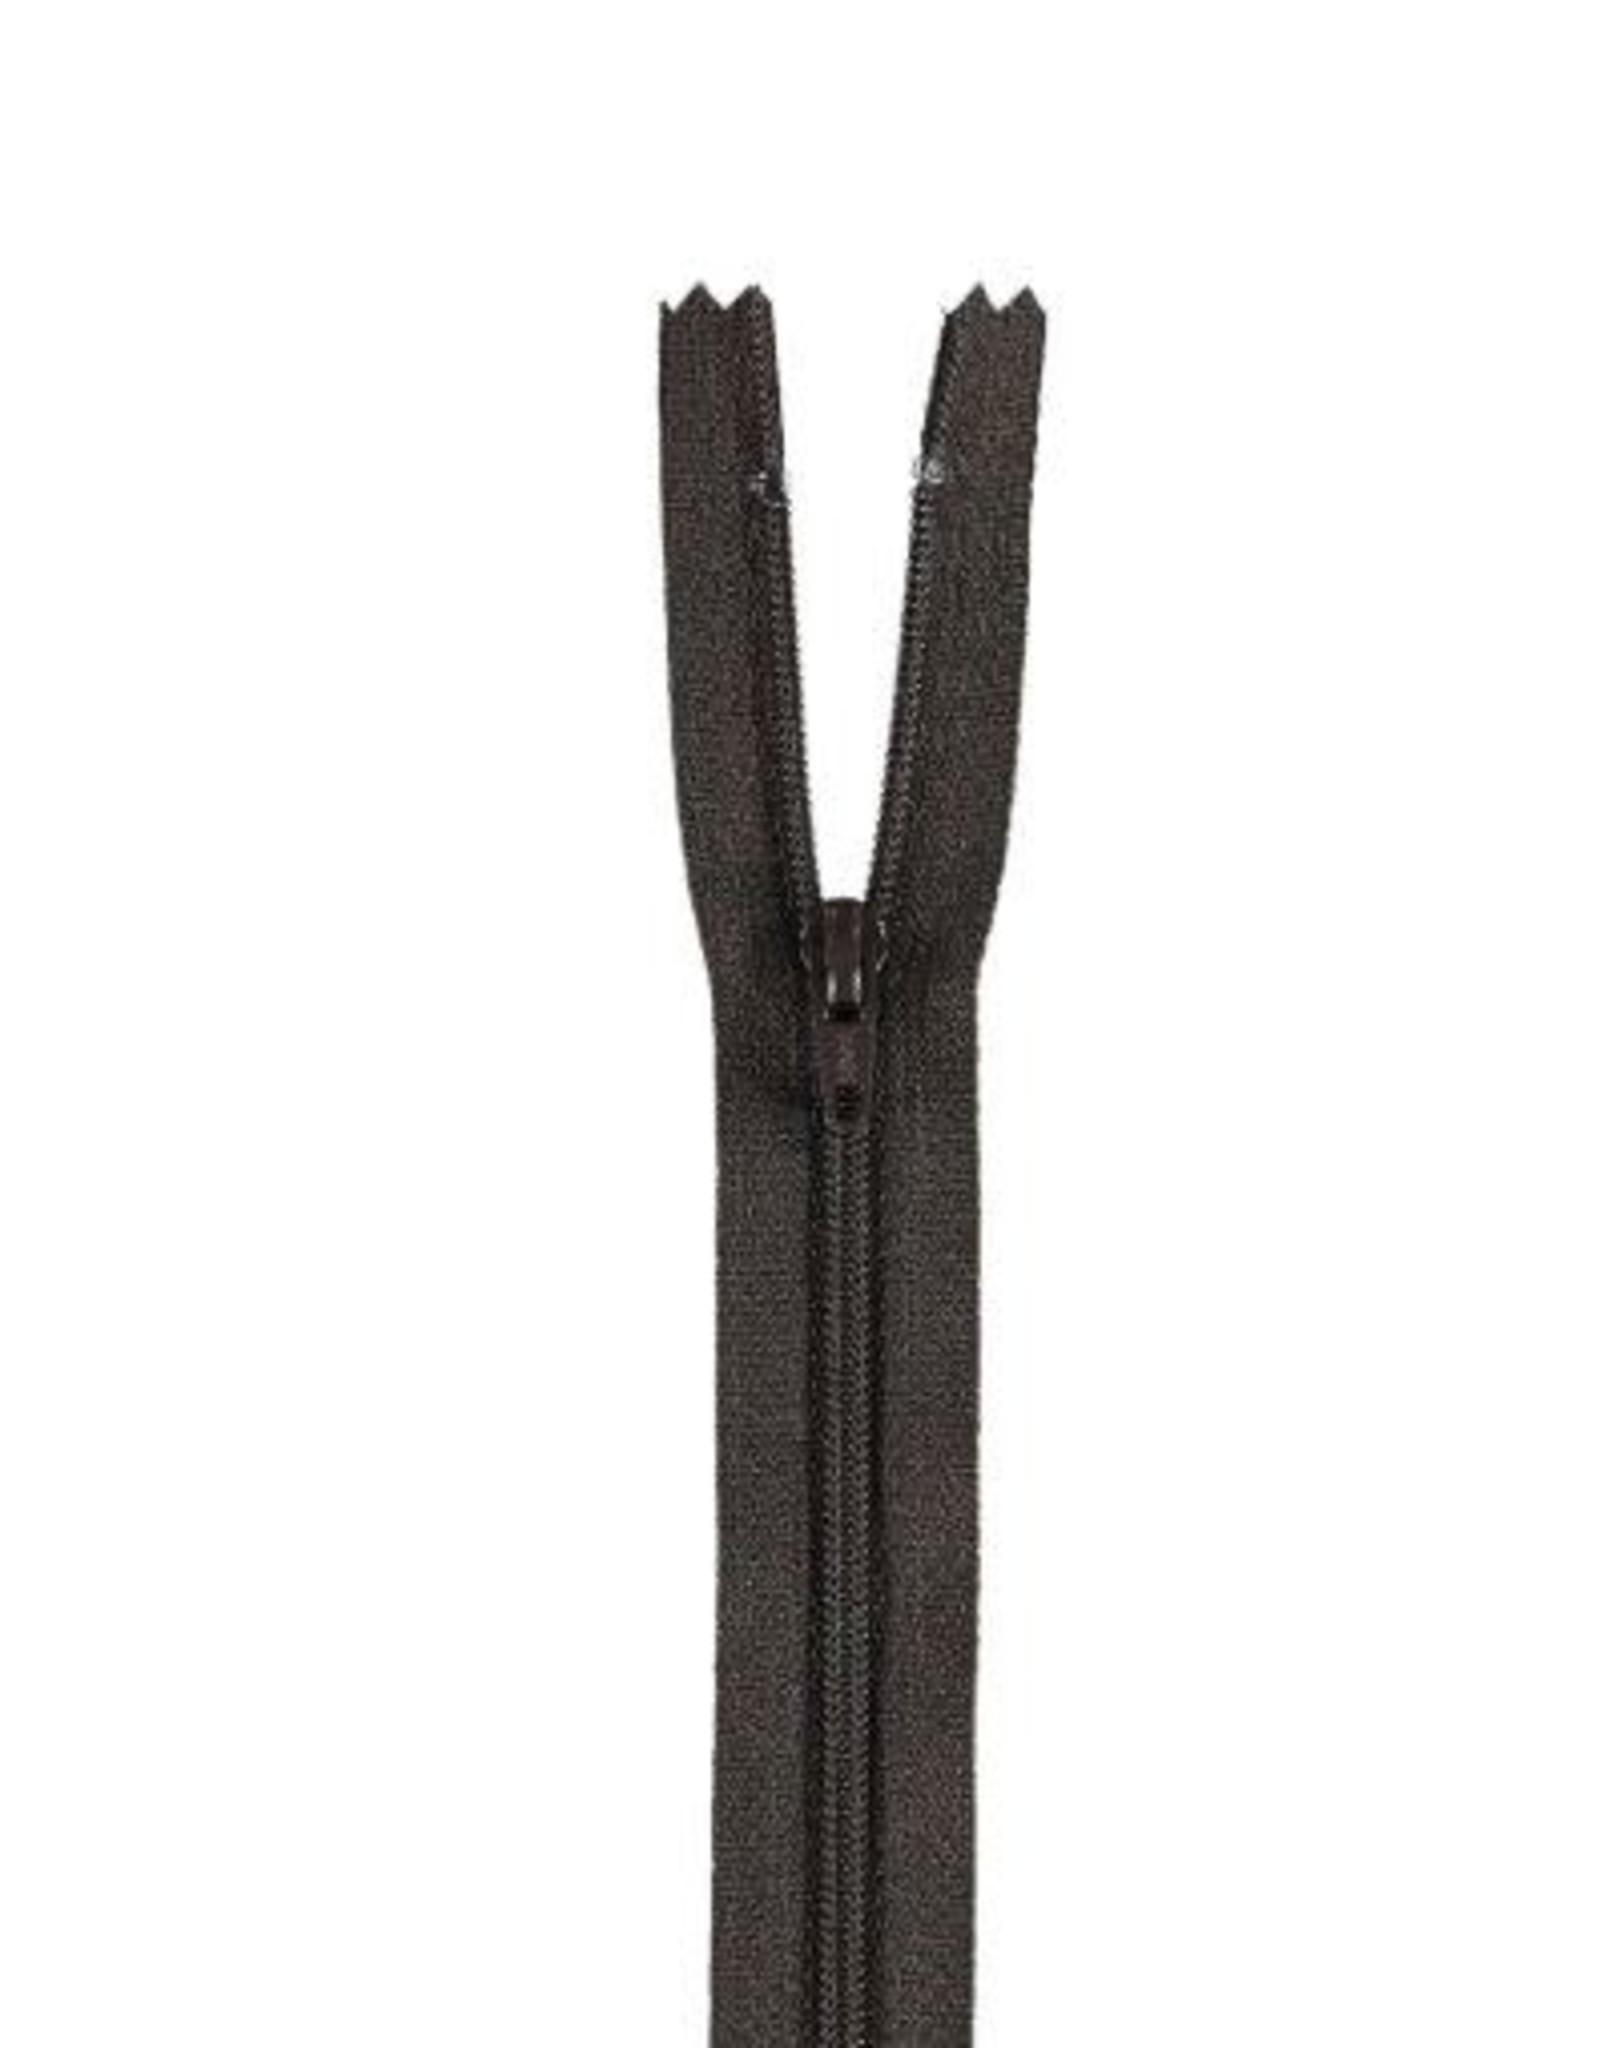 YKK Spiraalrits niet-DB 3mm zwart bruin 916-15cm